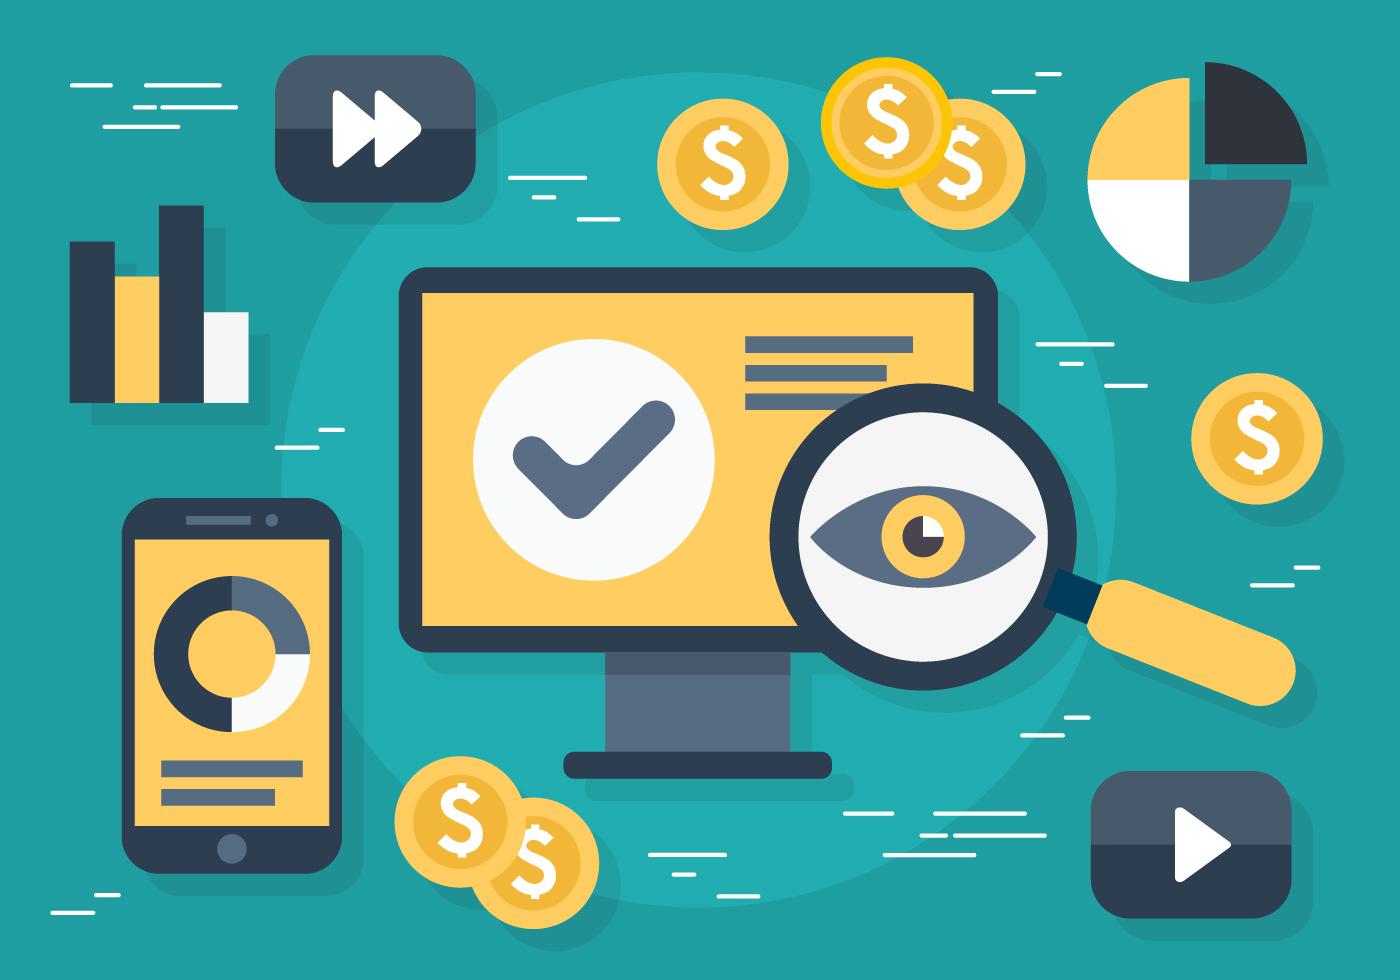 Free Flat Digital Marketing Vector Illustration - Download ...